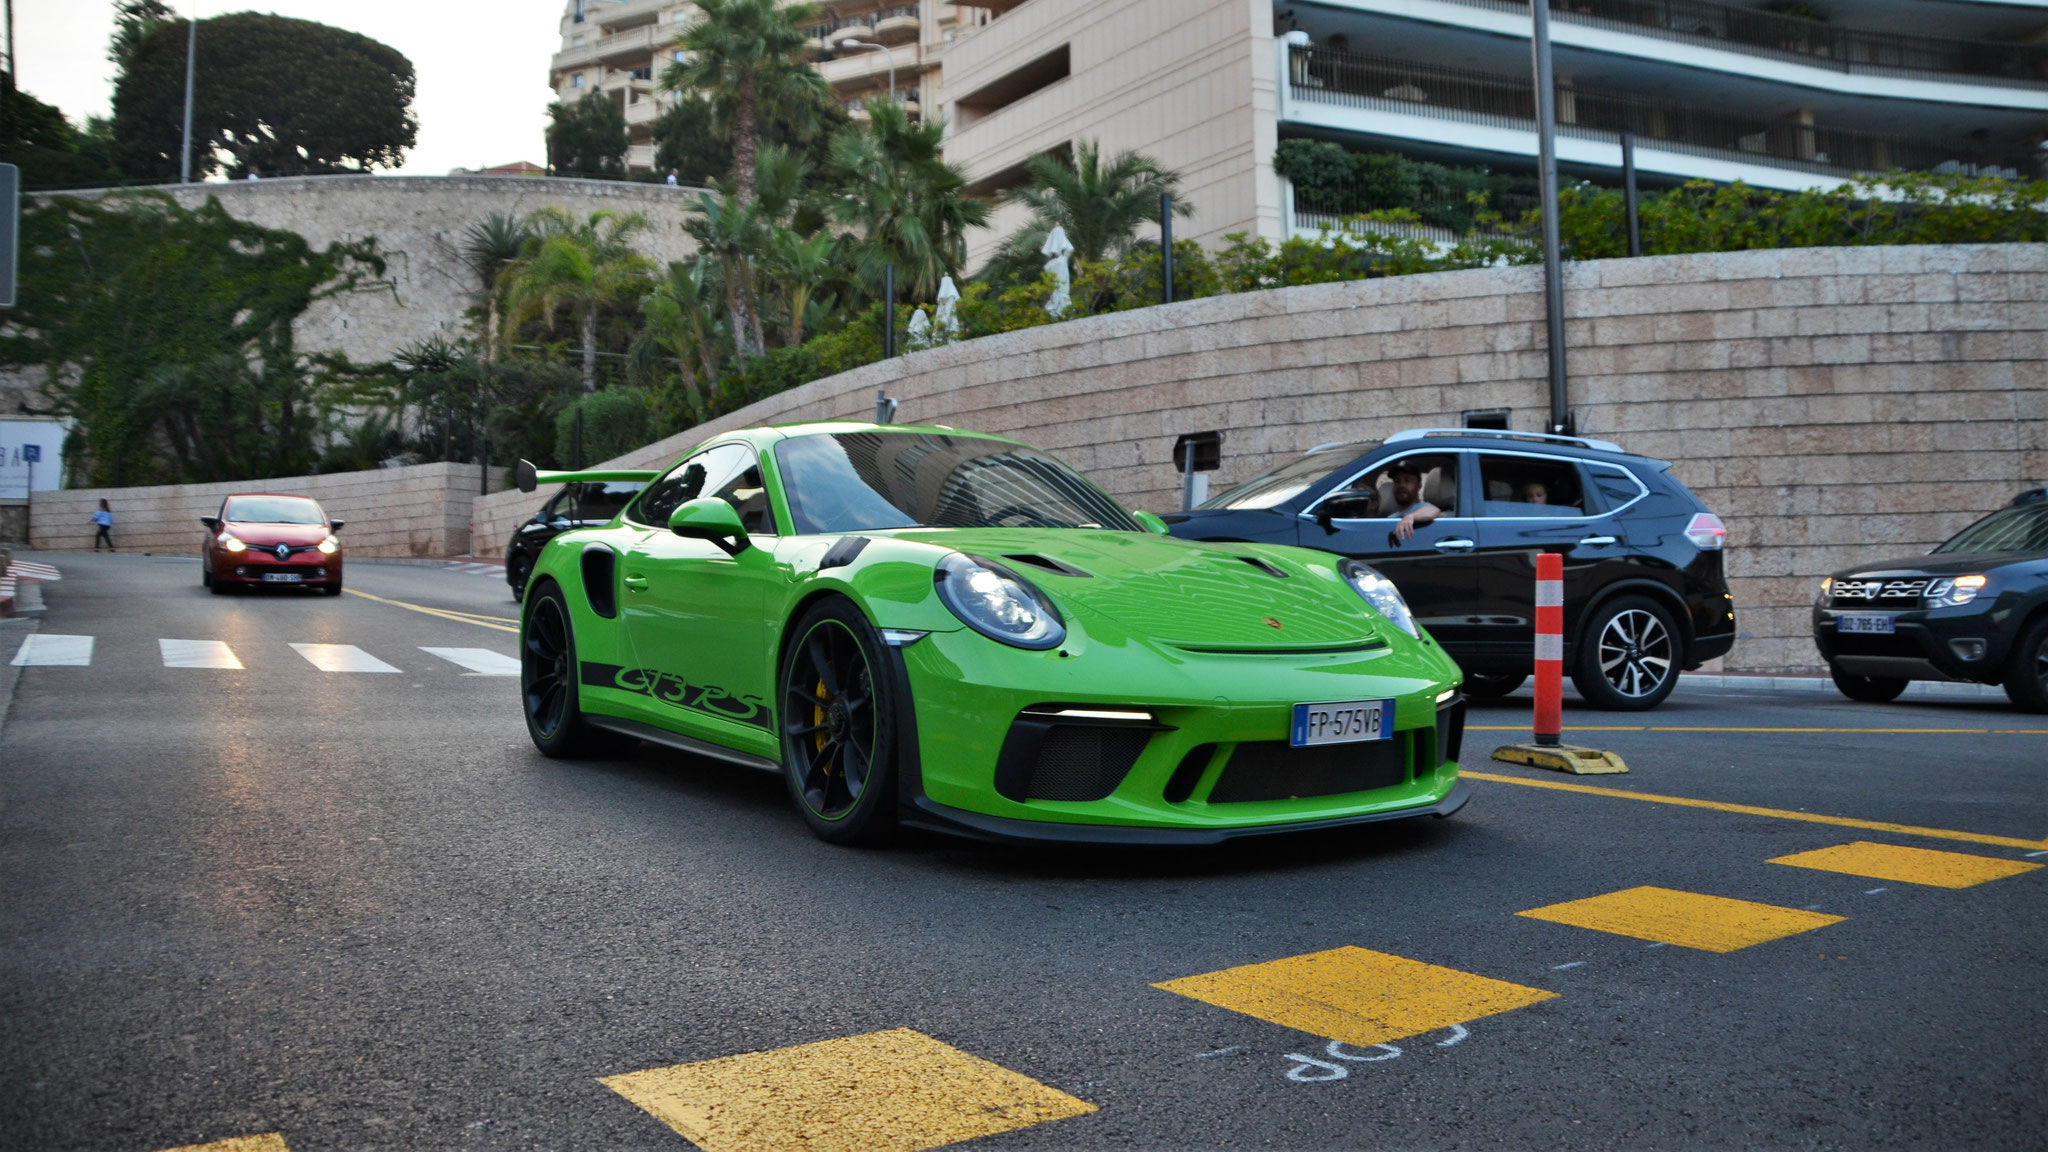 Porsche 911 991.2 GT3 RS - FP-757-VB (ITA)